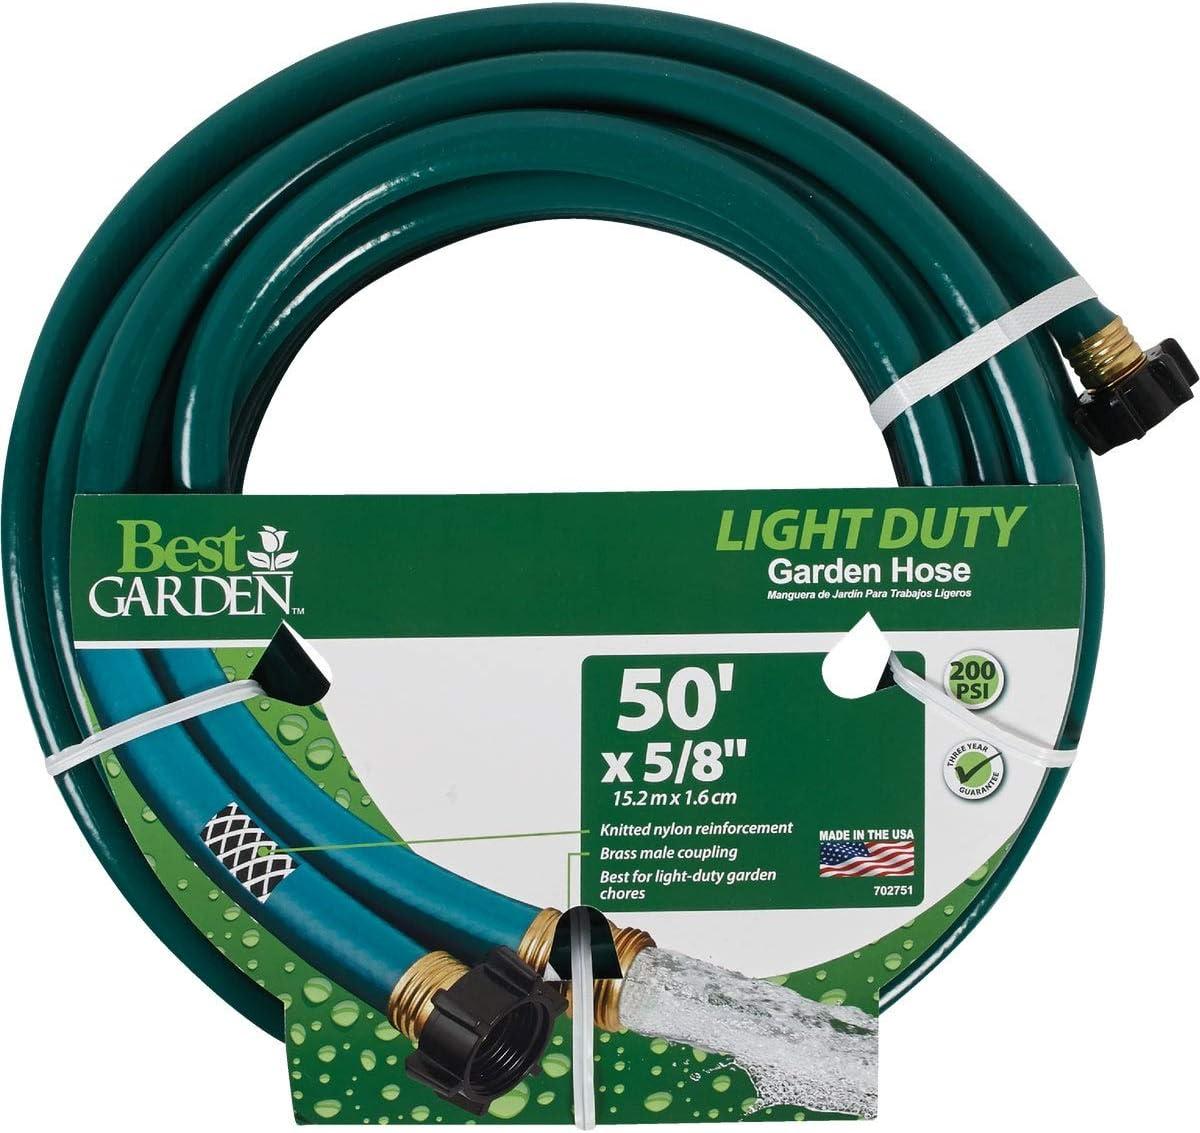 Best Garden 5/8 in. Dia. x 50 Ft. L. Light-Duty Garden Hose - 1 Each